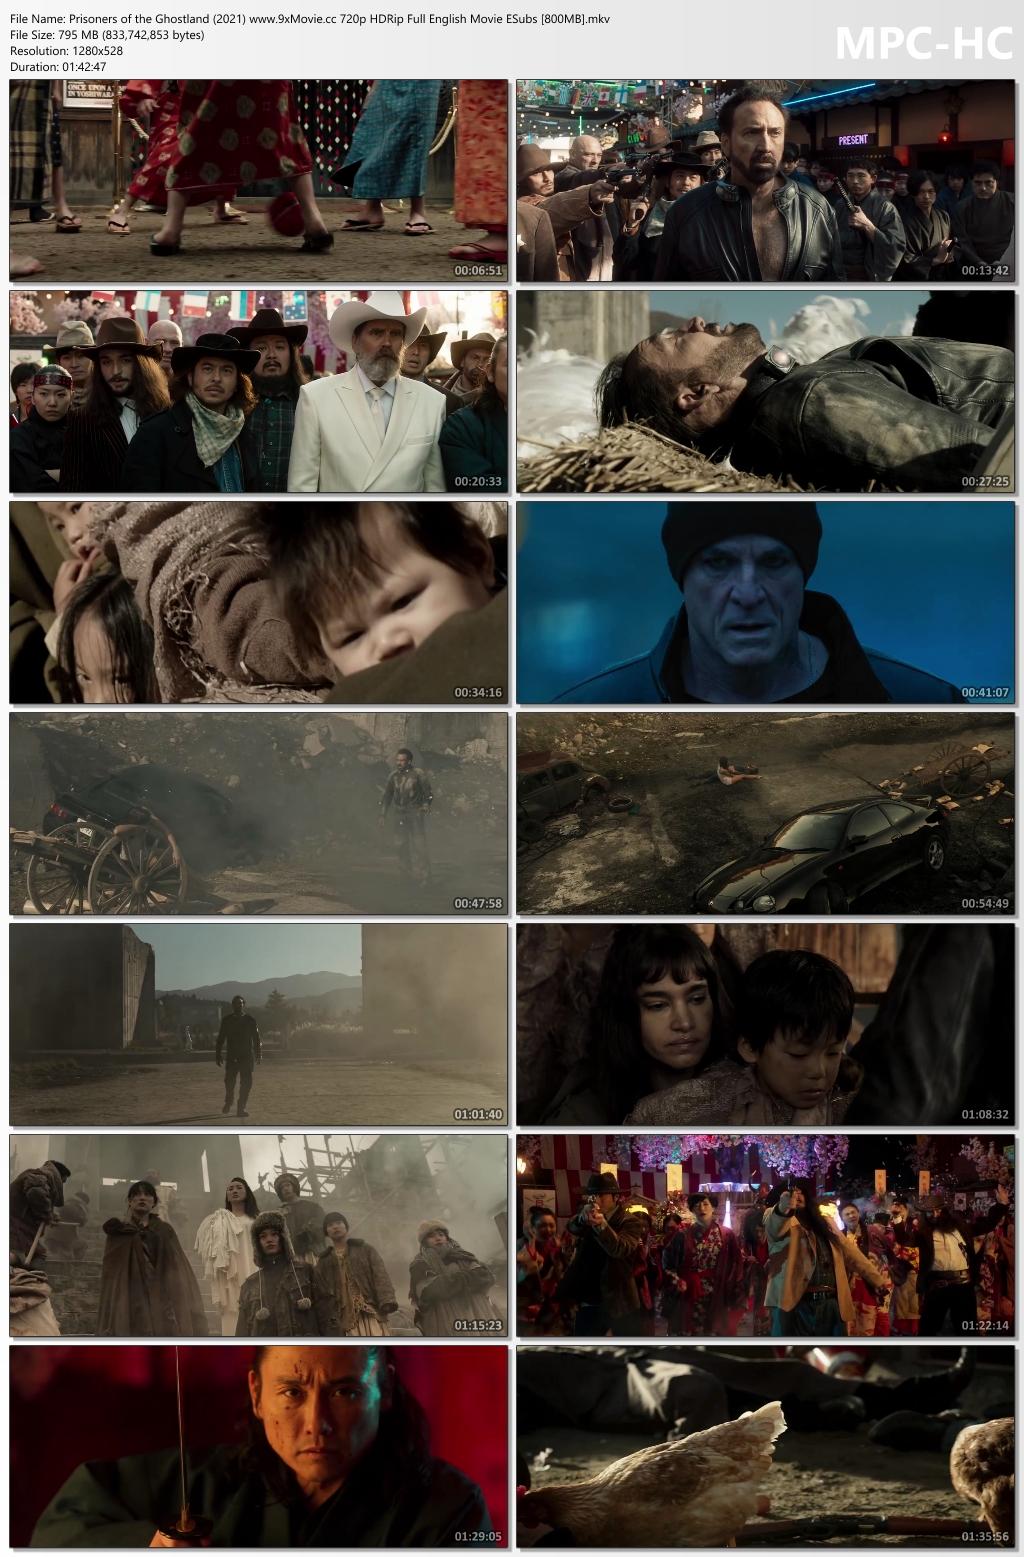 Prisoners-of-the-Ghostland-2021-www-9x-Movie-cc-720p-HDRip-Full-English-Movie-ESubs-800-MB-mkv